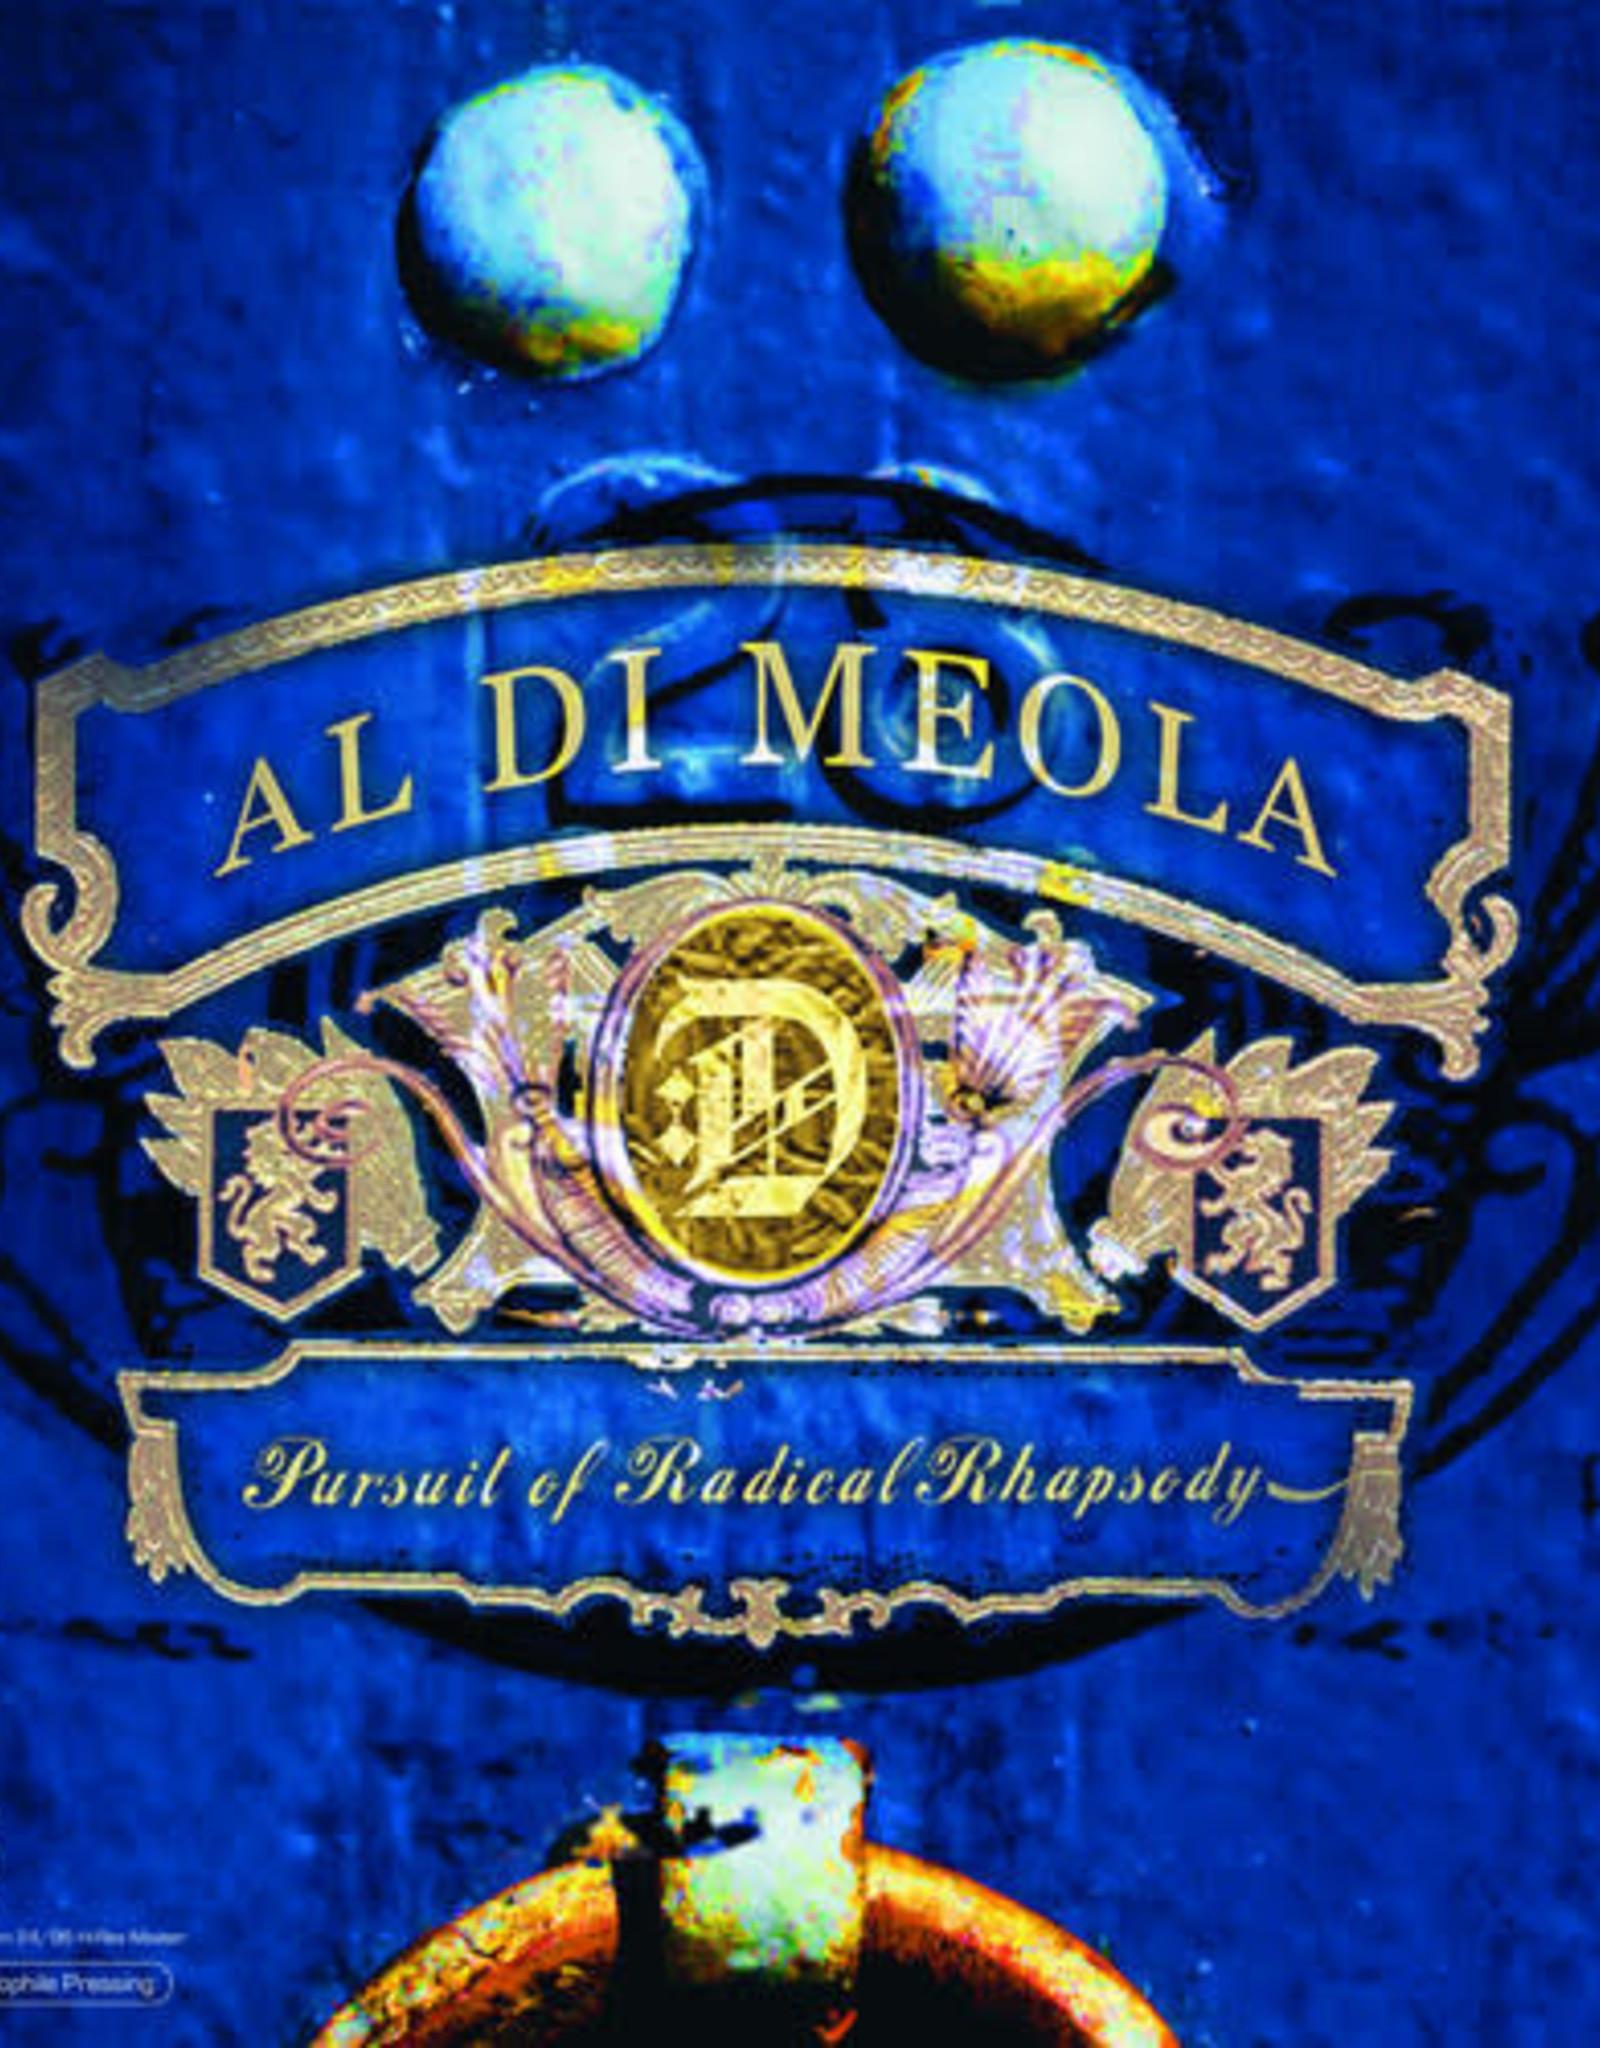 Al Di Meola - Pursuit Of Radical Rhapsody